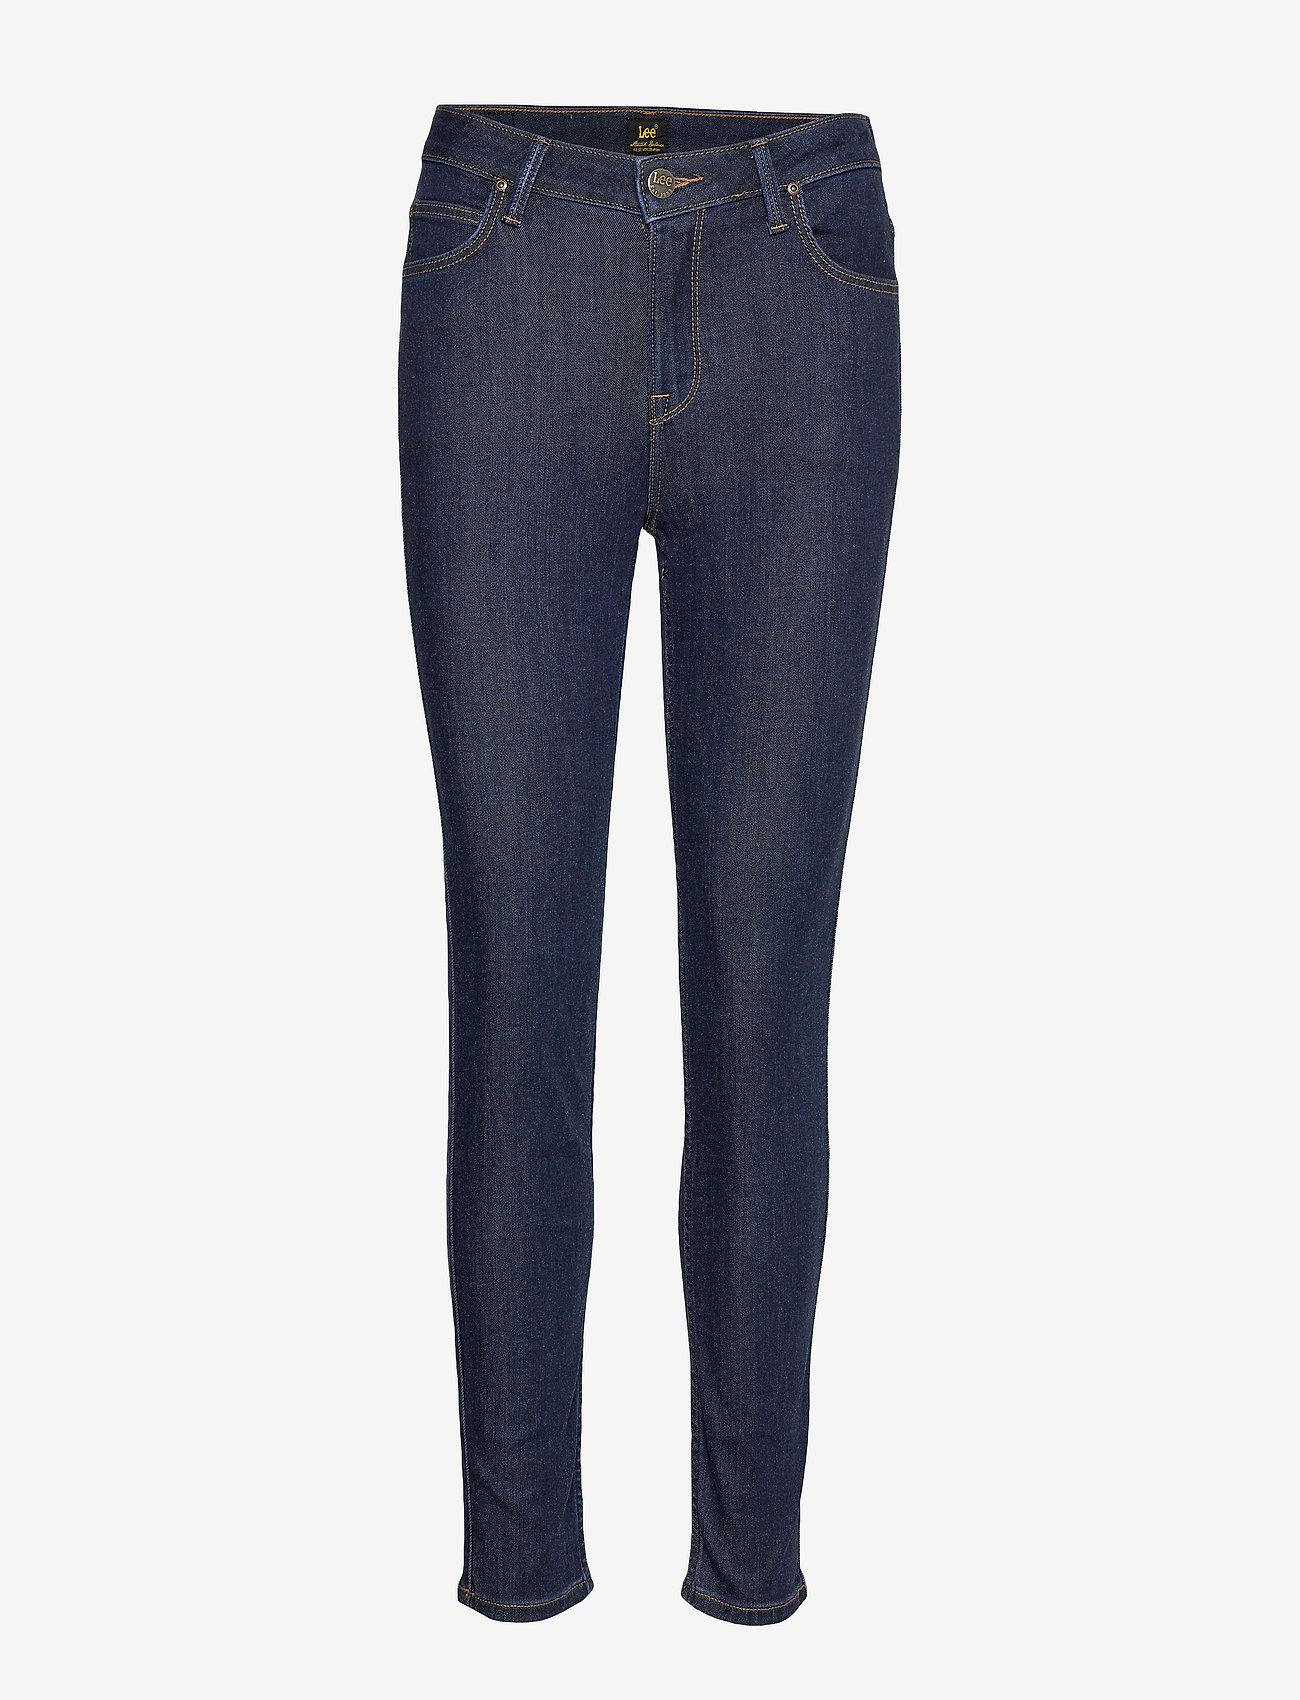 Lee Jeans - Scarlett High - slim jeans - tonal stonewash - 0